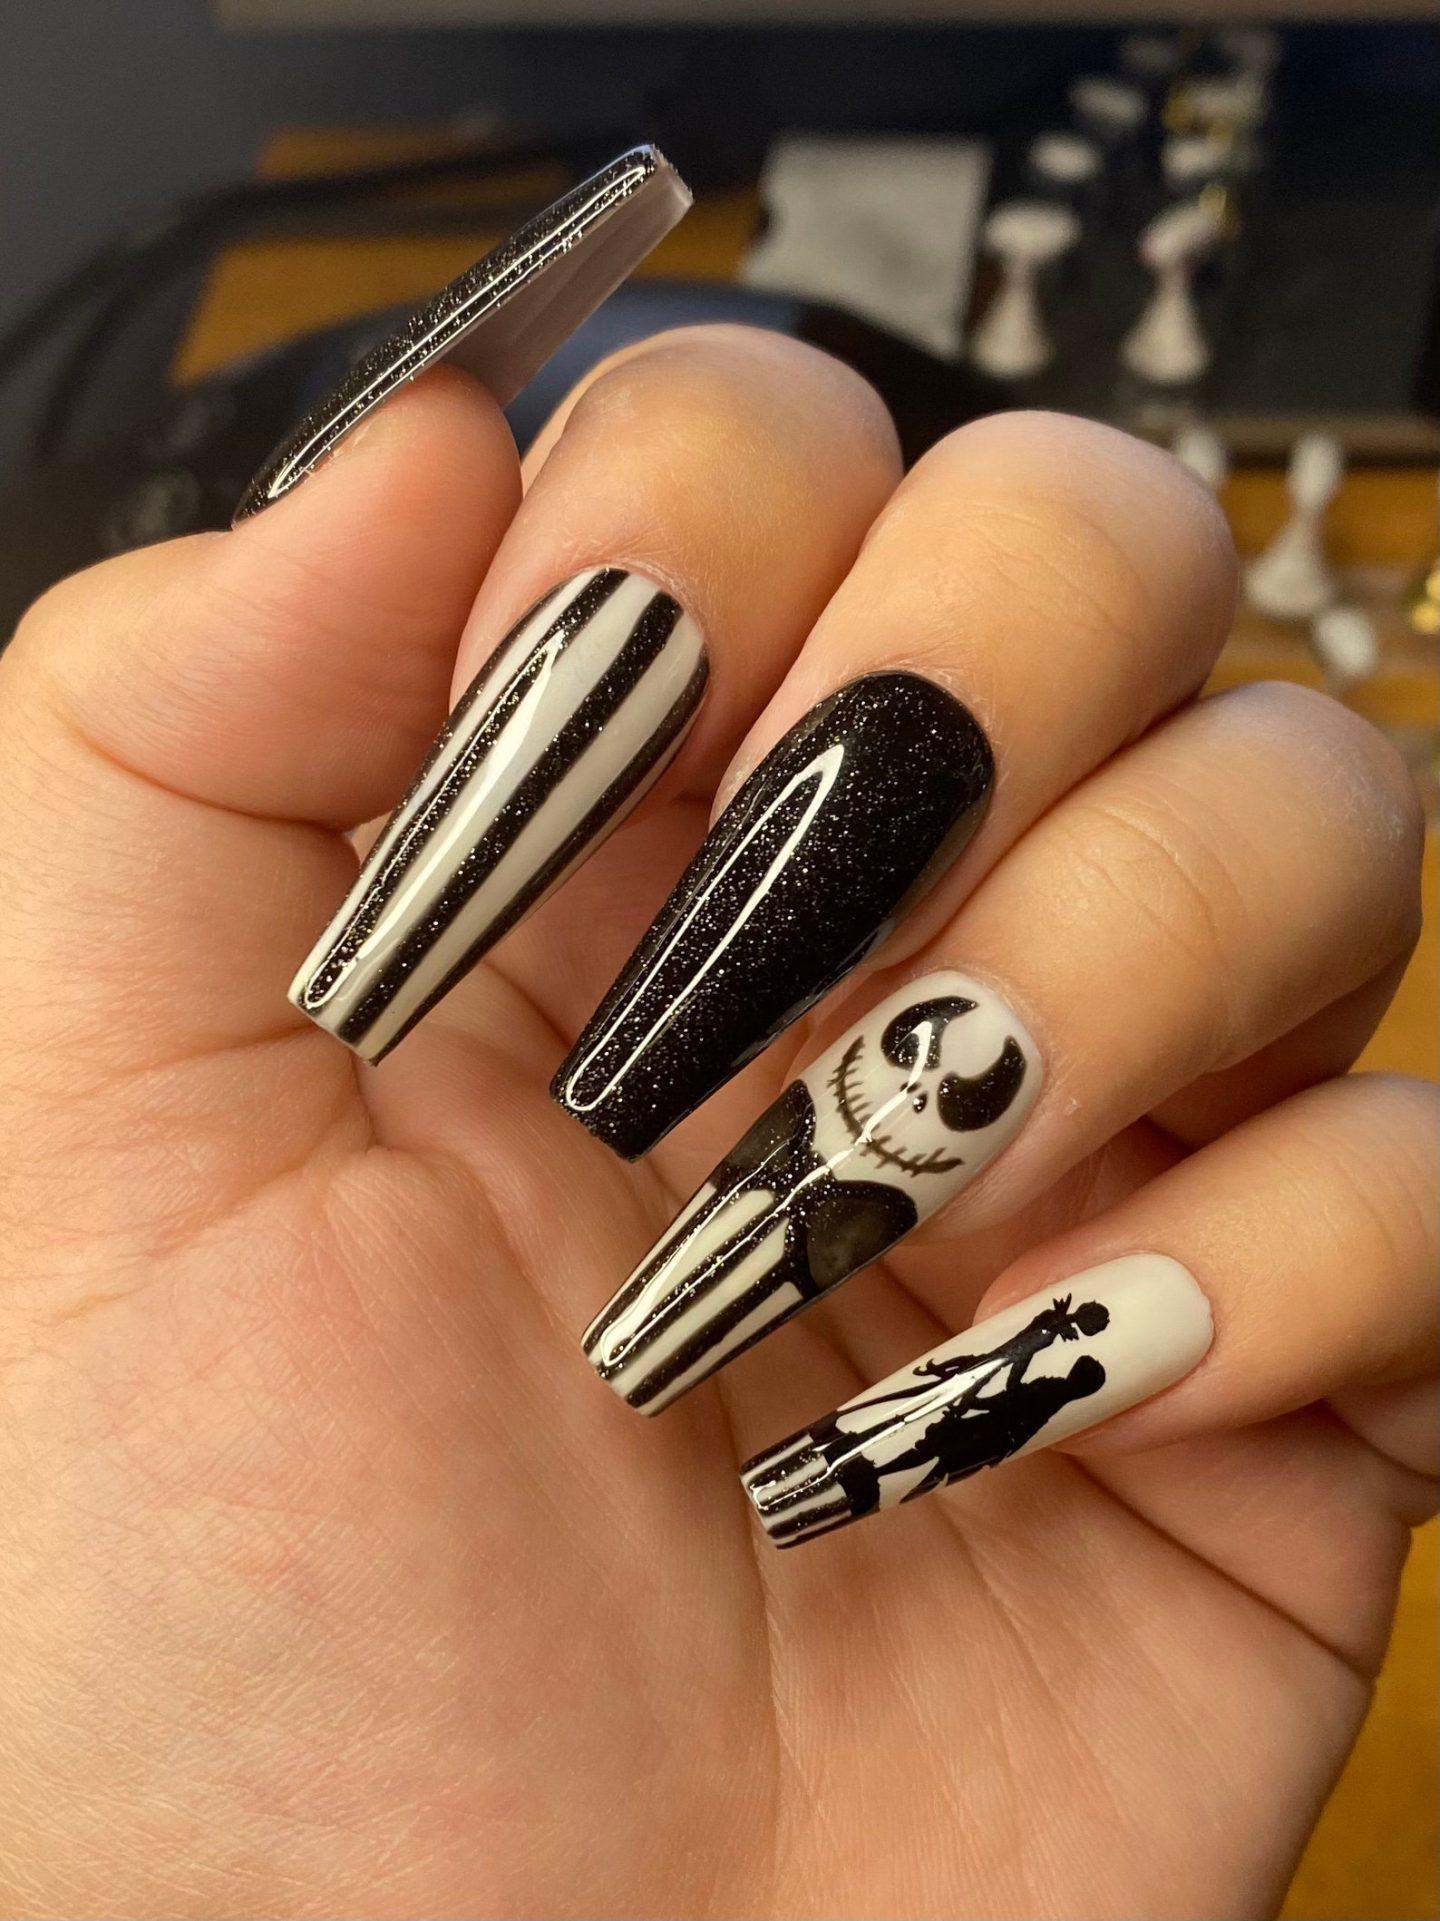 Black and white Jack Skellington nails